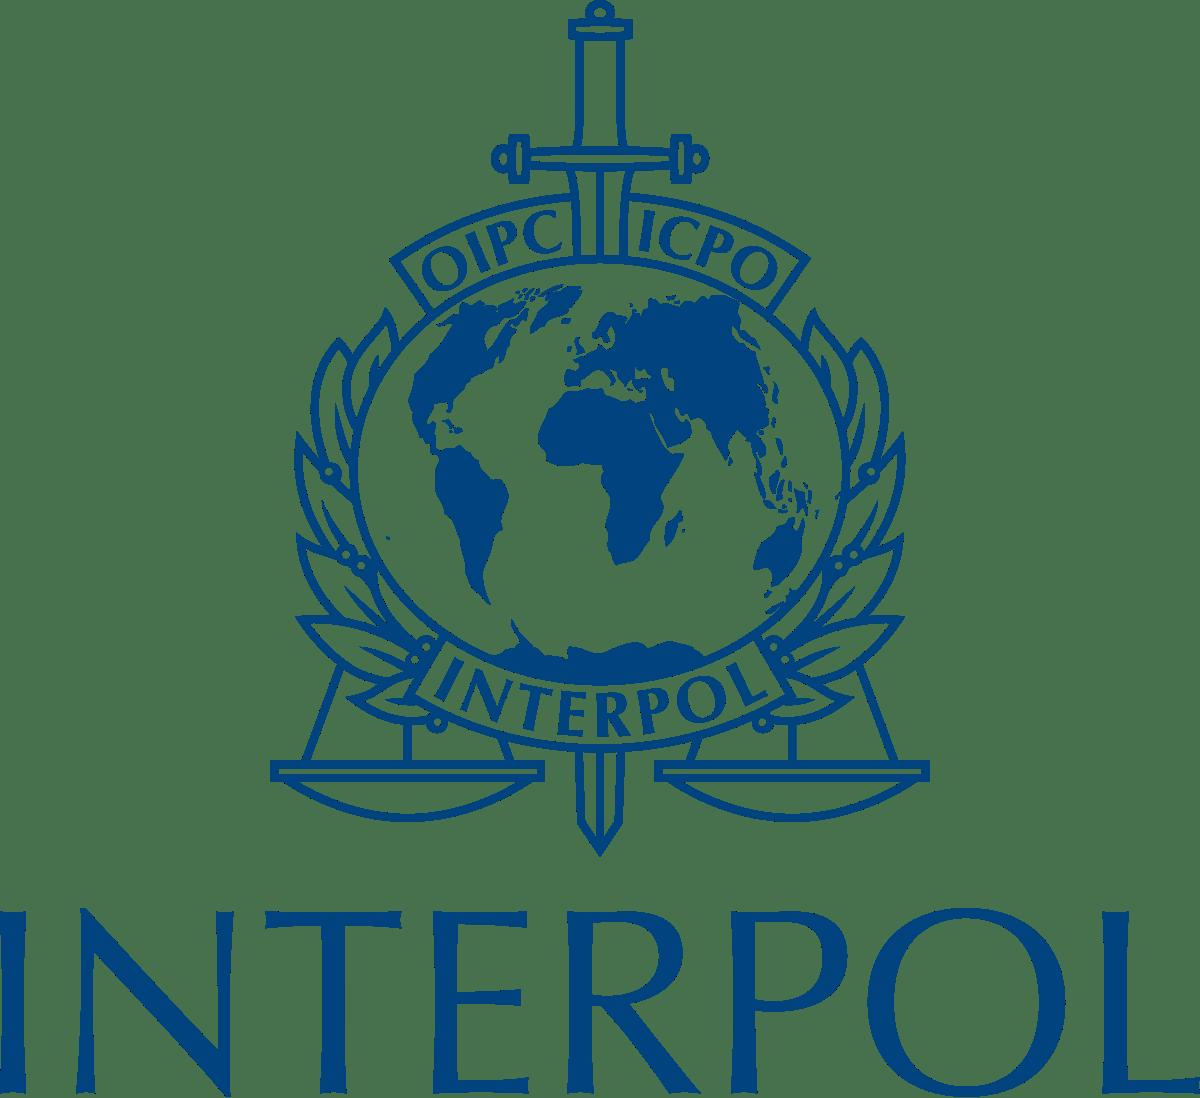 Burkina Faso – Ministère de la Sécurité : Le Burkina signe aujourd'hui un protocole d'accord avec l'Interpol